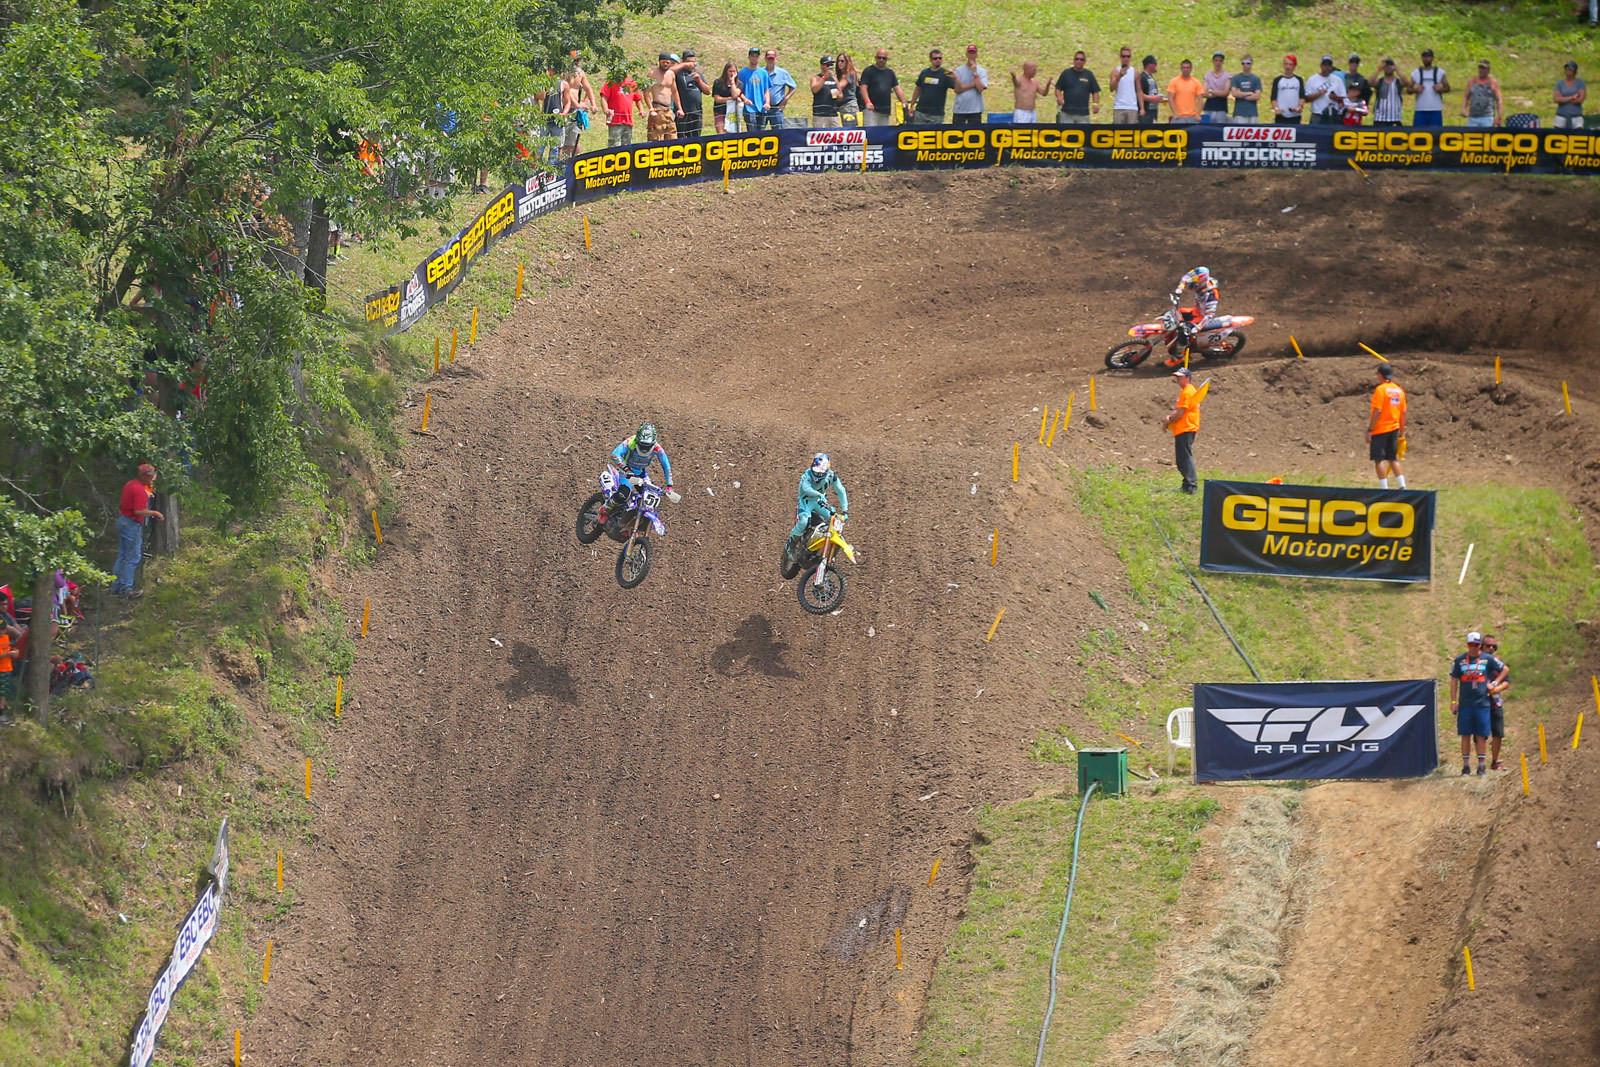 Justin Barcia and Ken Roczen - Photo Blast: Spring Creek - Motocross Pictures - Vital MX